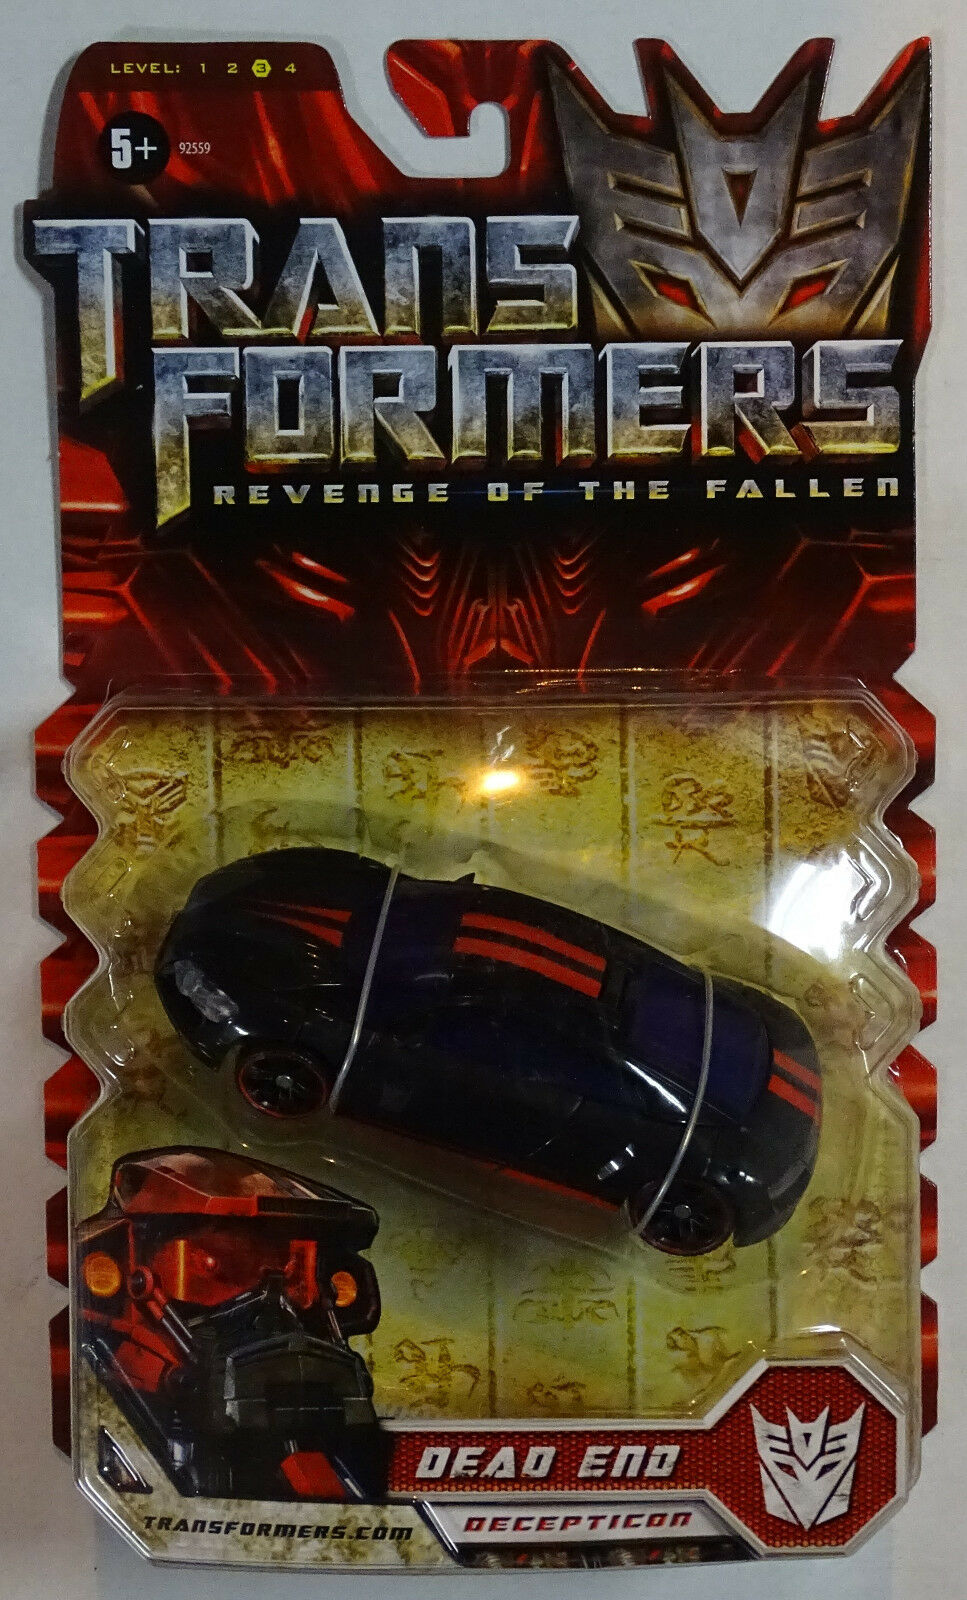 Hasbro ® 92559 Transformers Revenge of the Fallen Deluxe Dead End